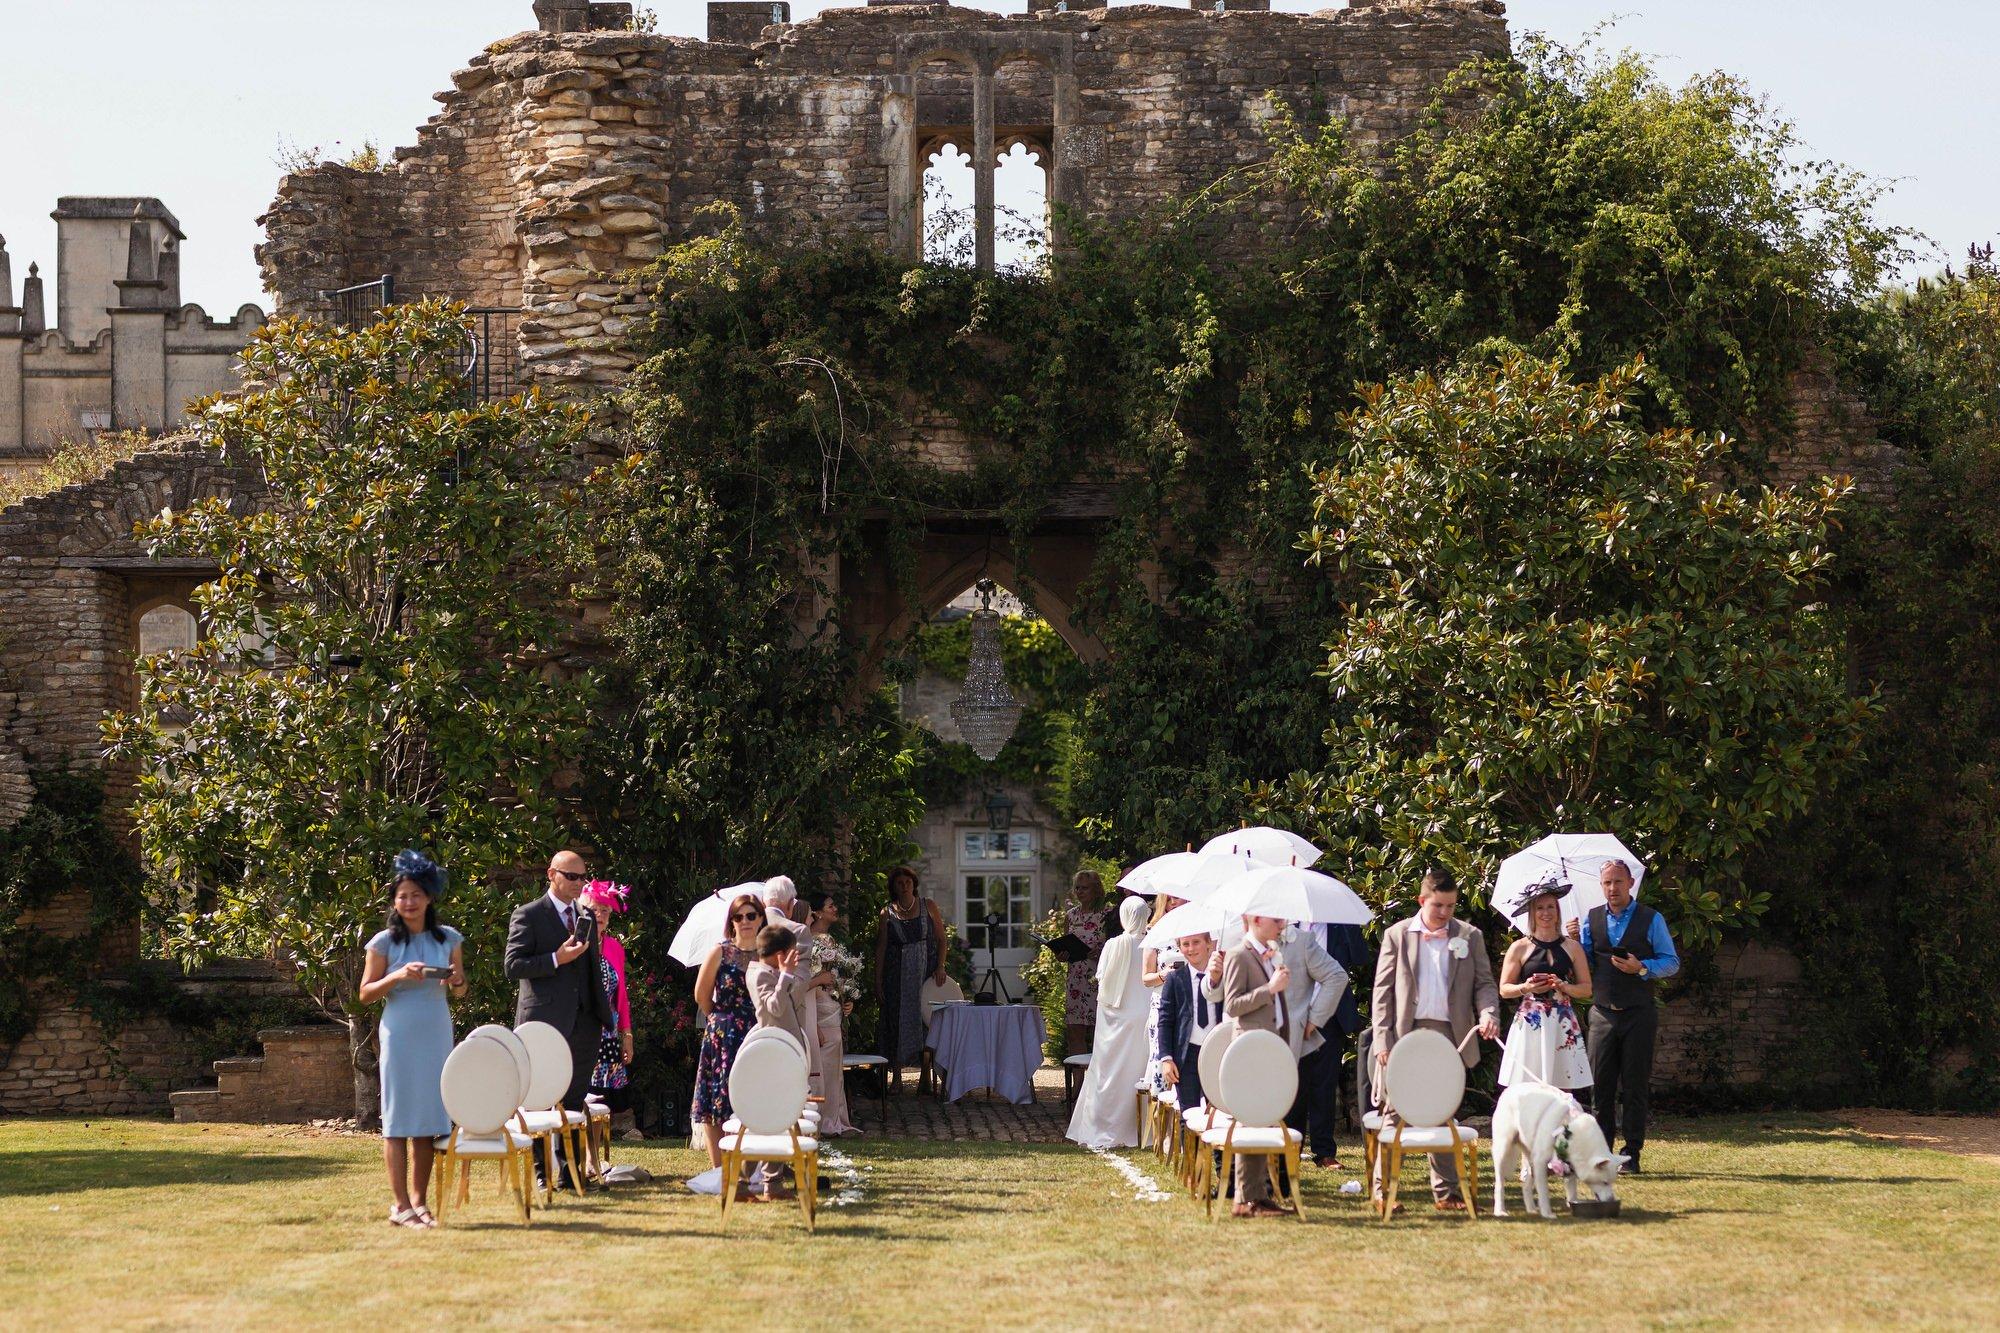 Euridge Manor, Cotswolds, civil ceremony, outdoors, Cotswolds wedding photographer